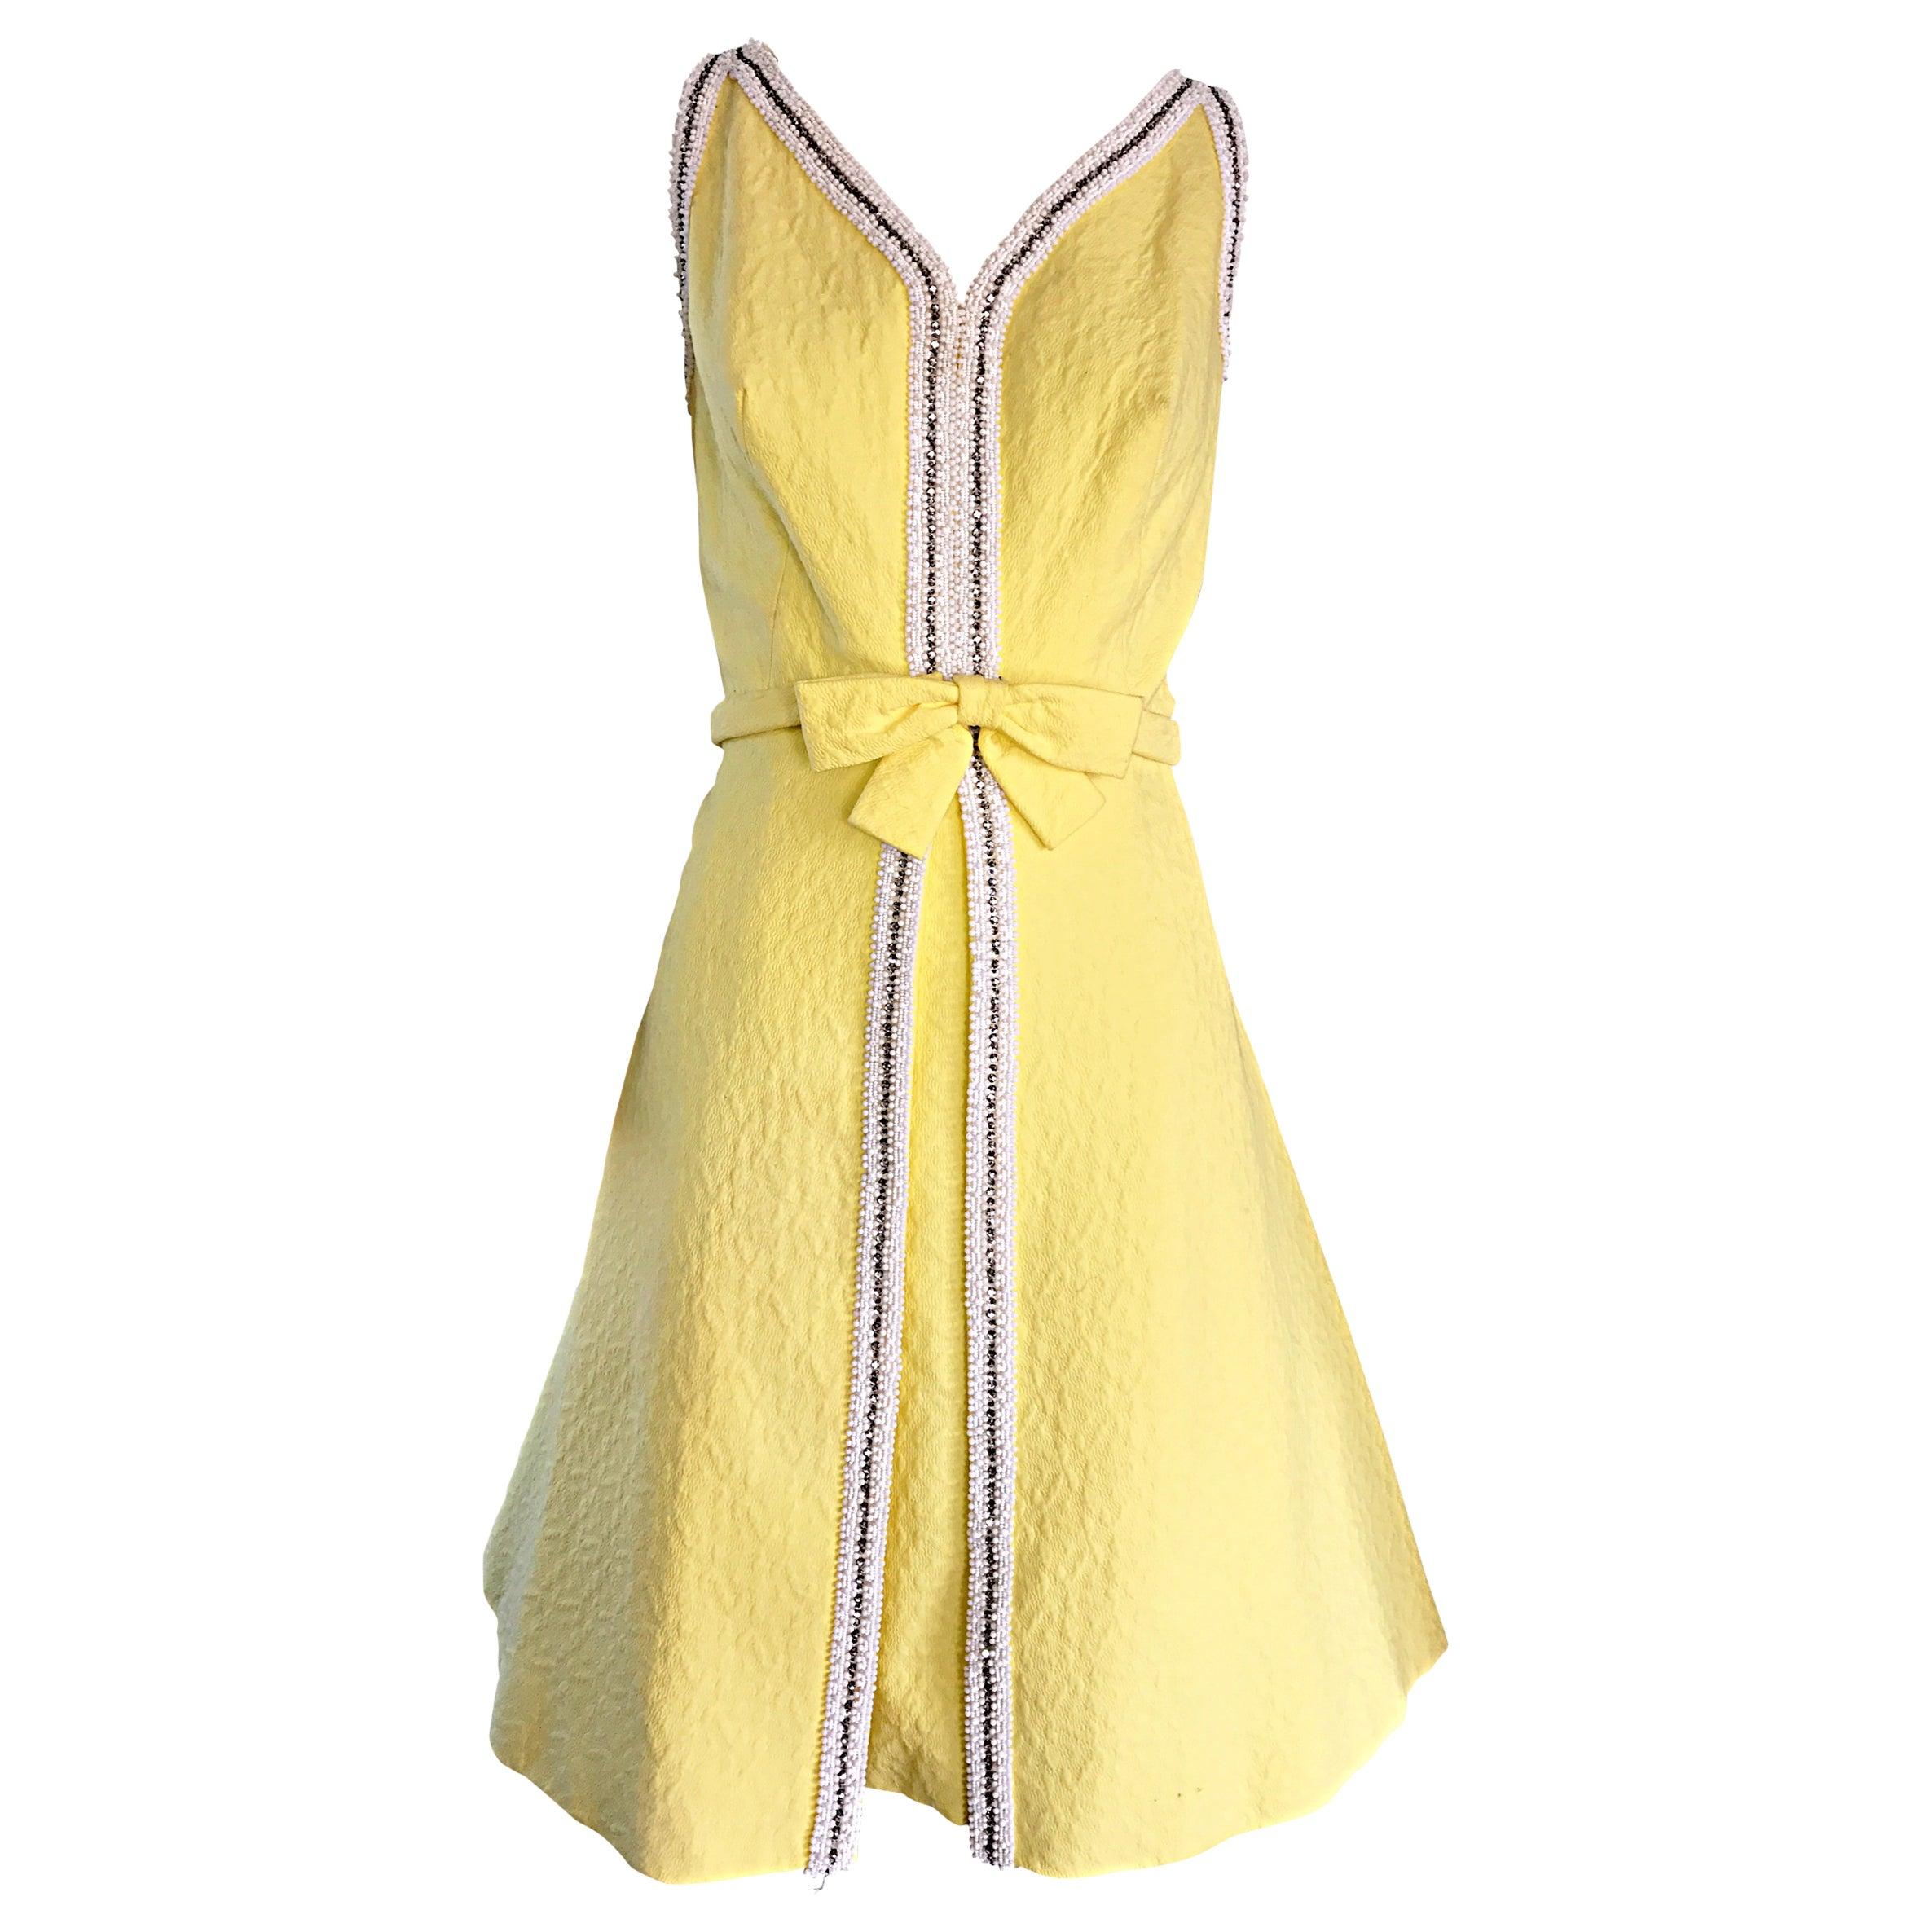 Chic 1960s Seaton Enterprises Ltd. Vintage Large Size Yellow 60s A Line Dress